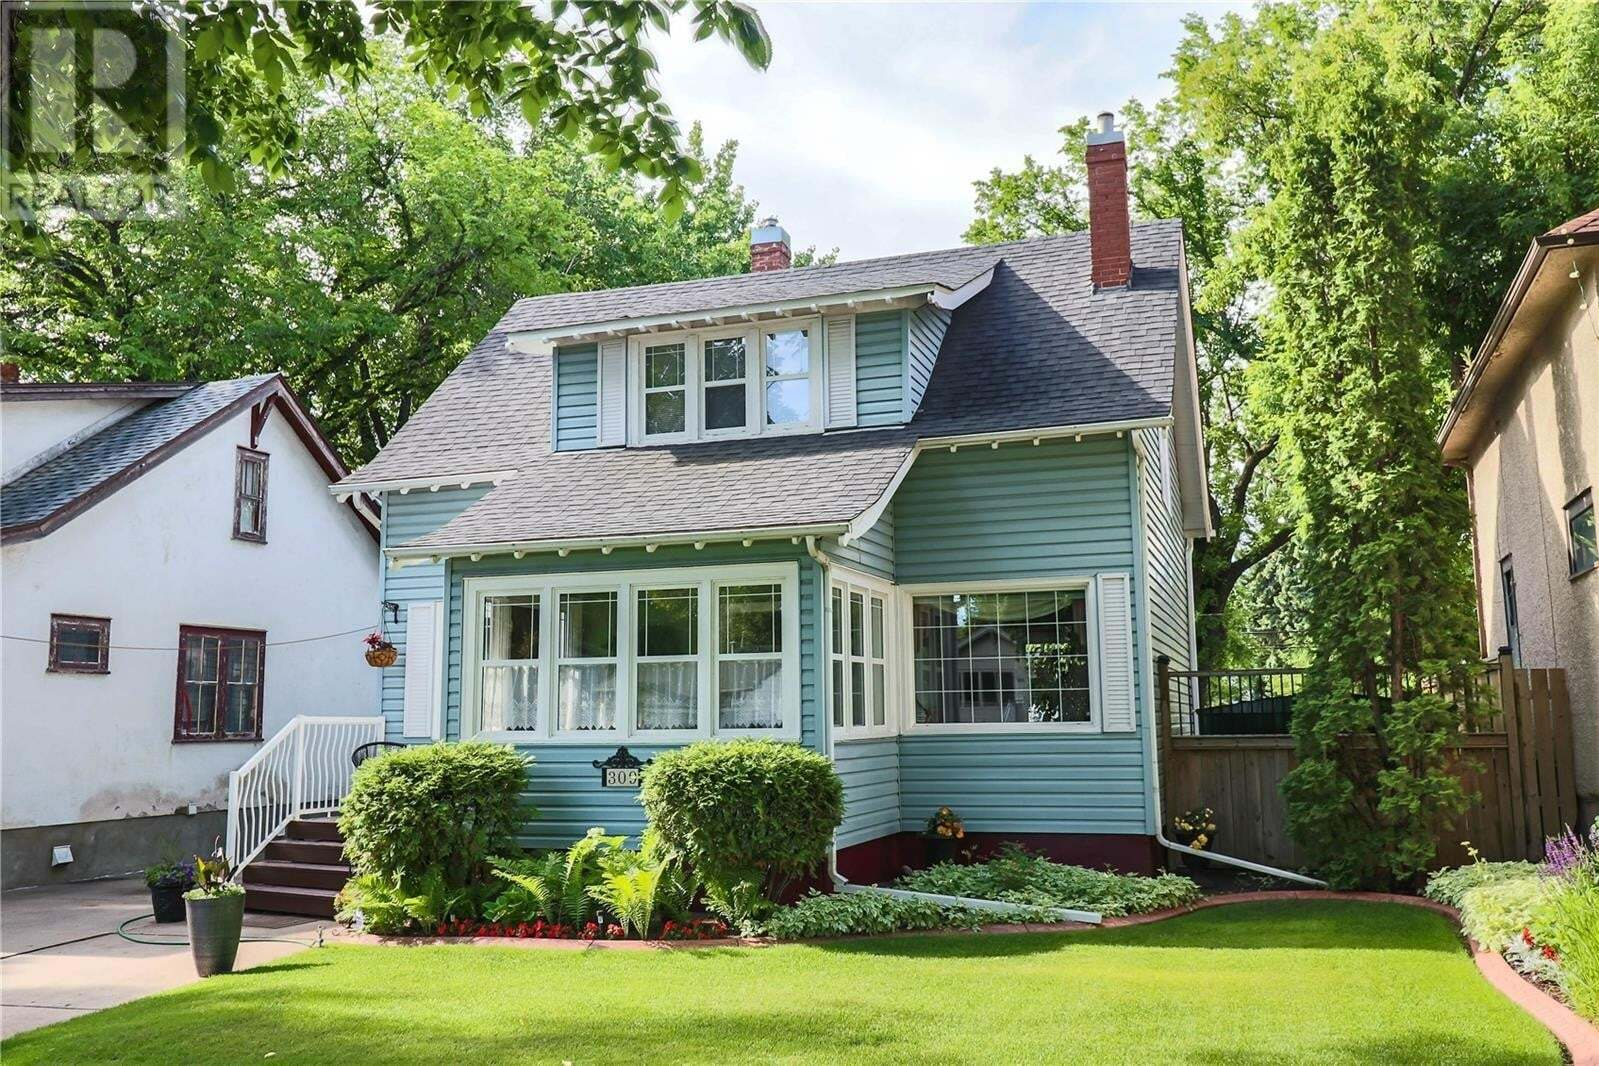 House for sale at 309 29th St W Saskatoon Saskatchewan - MLS: SK814324